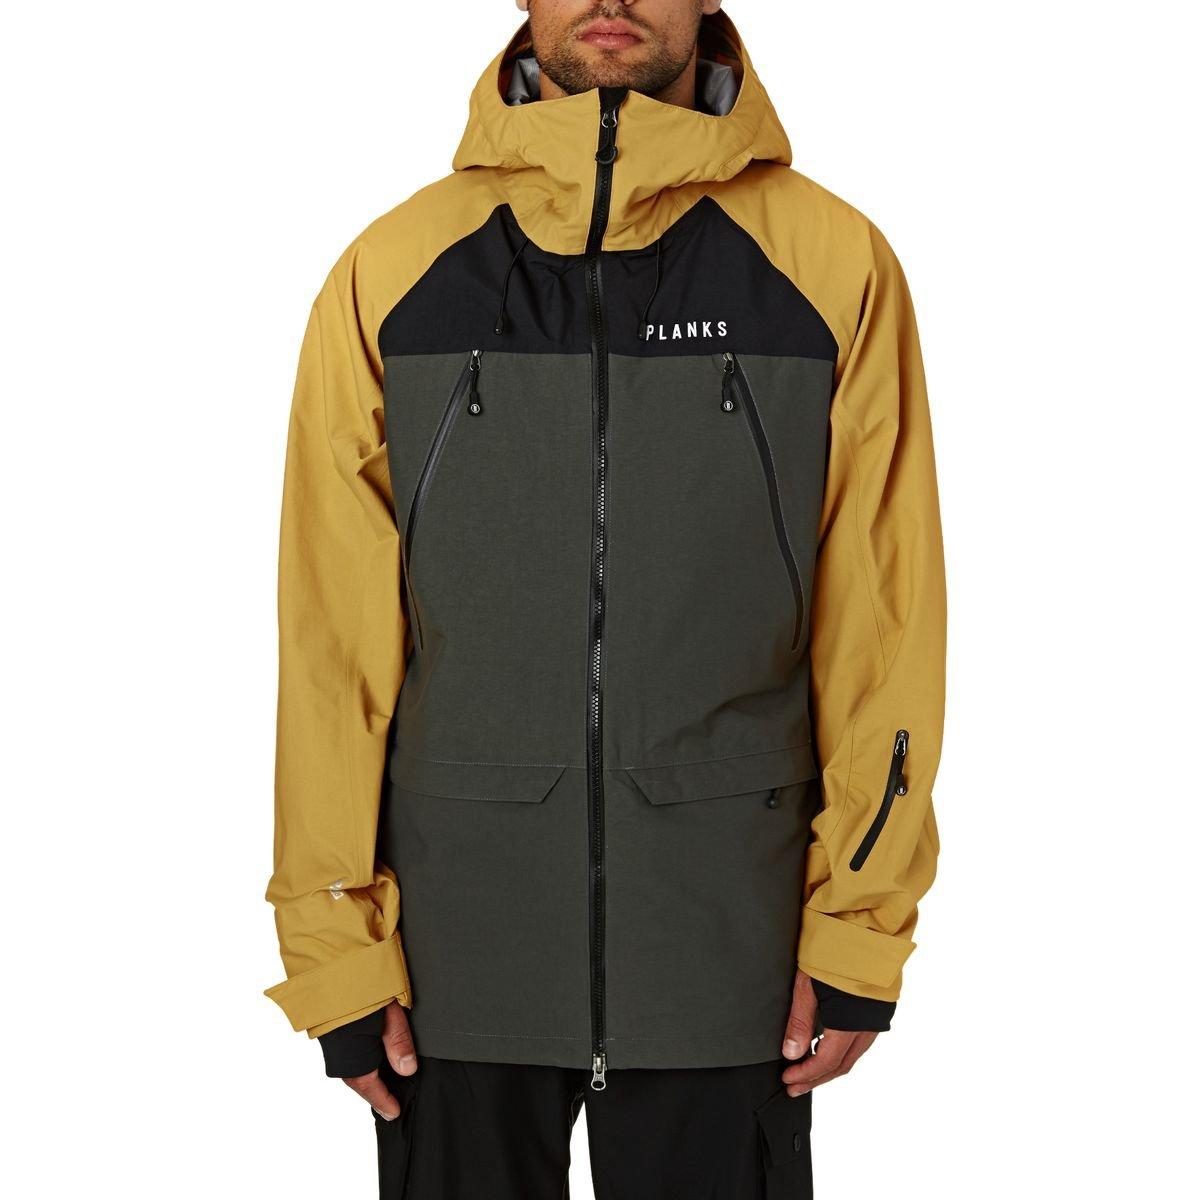 Planks Clothing Yeti Hunter 3層Jacket – Men 's B076PT5HXJ  マスタード X-Large